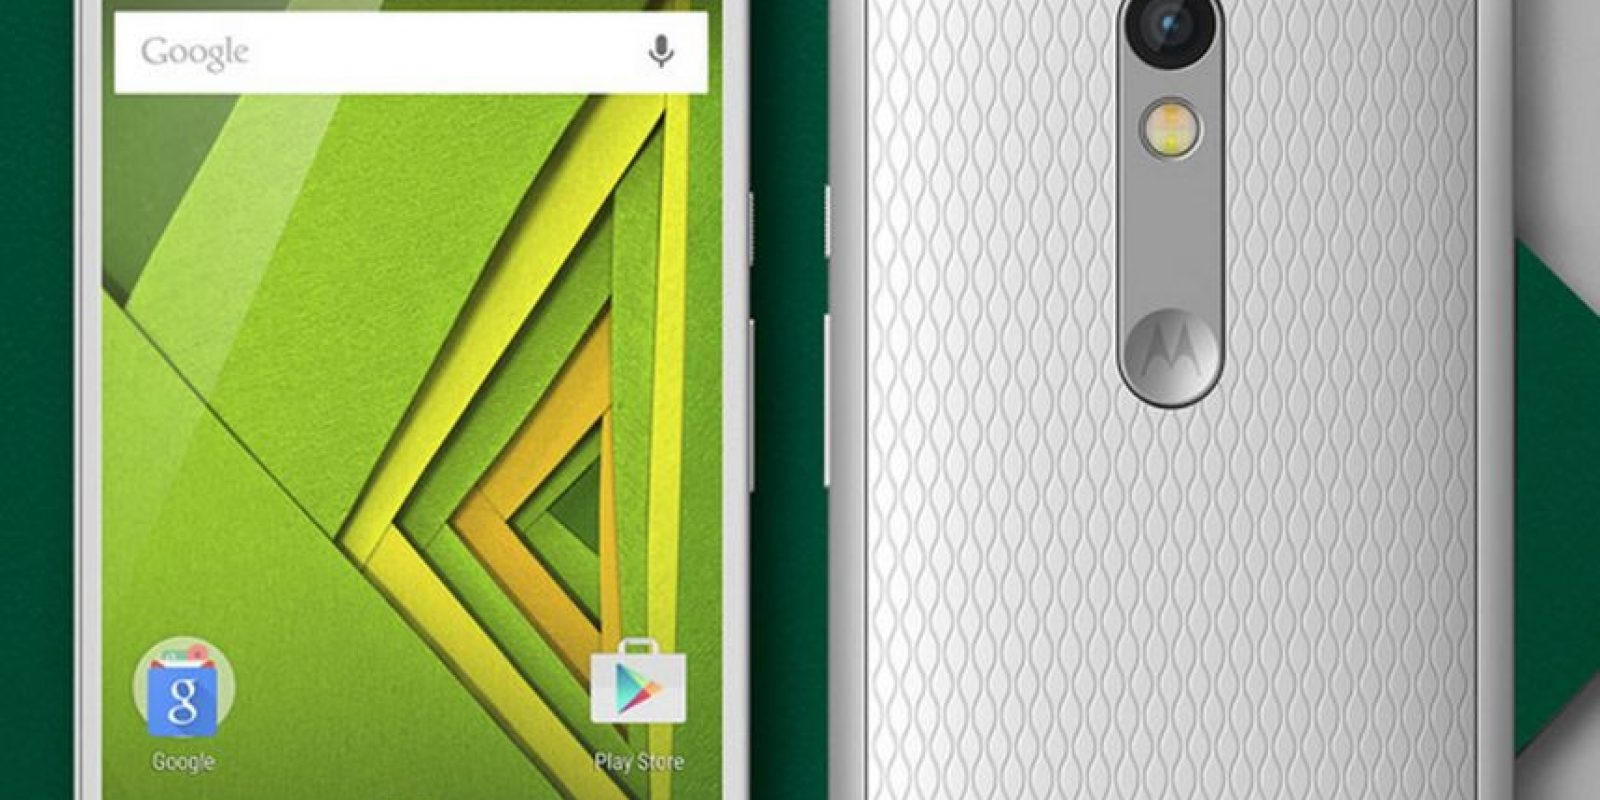 Pantalla: 5,5 pulgadas fullHD / Procesador: Snapdragon 615 Foto:Motorola